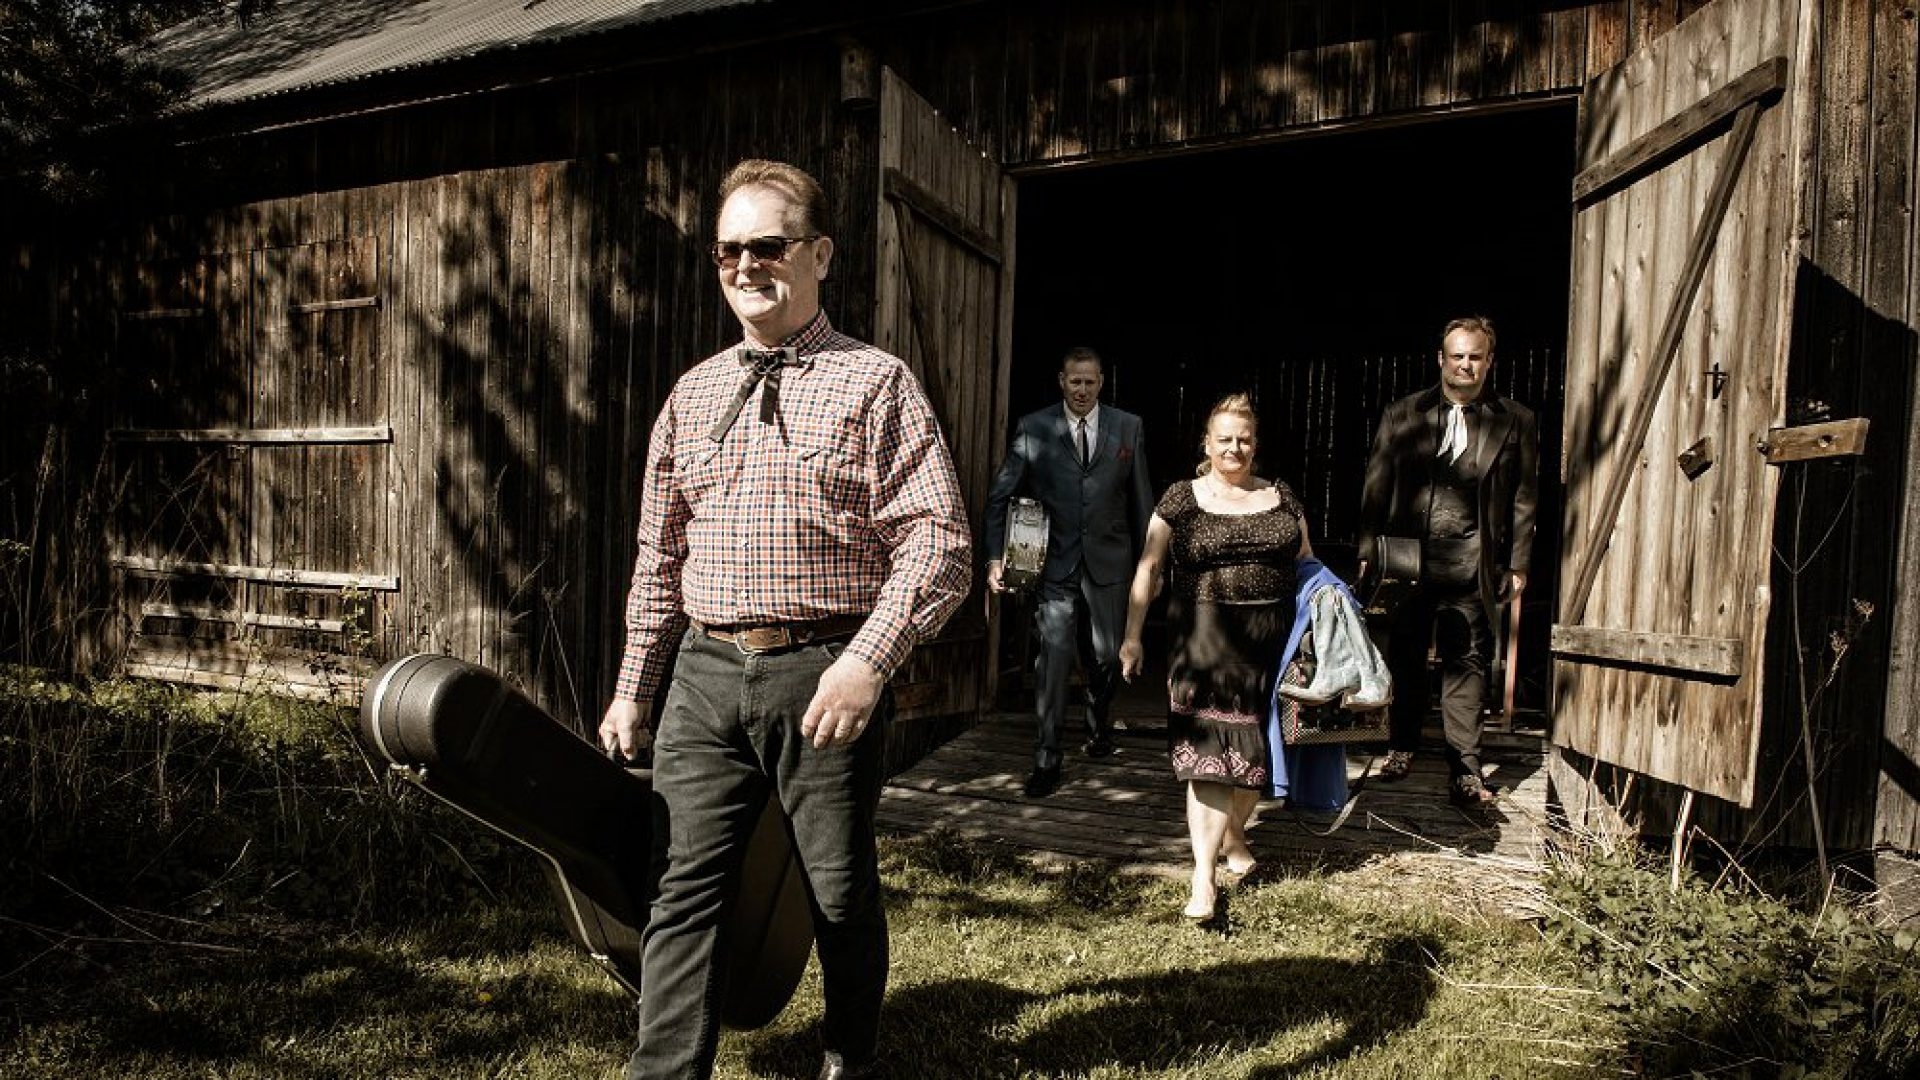 The Clint Bradley Band